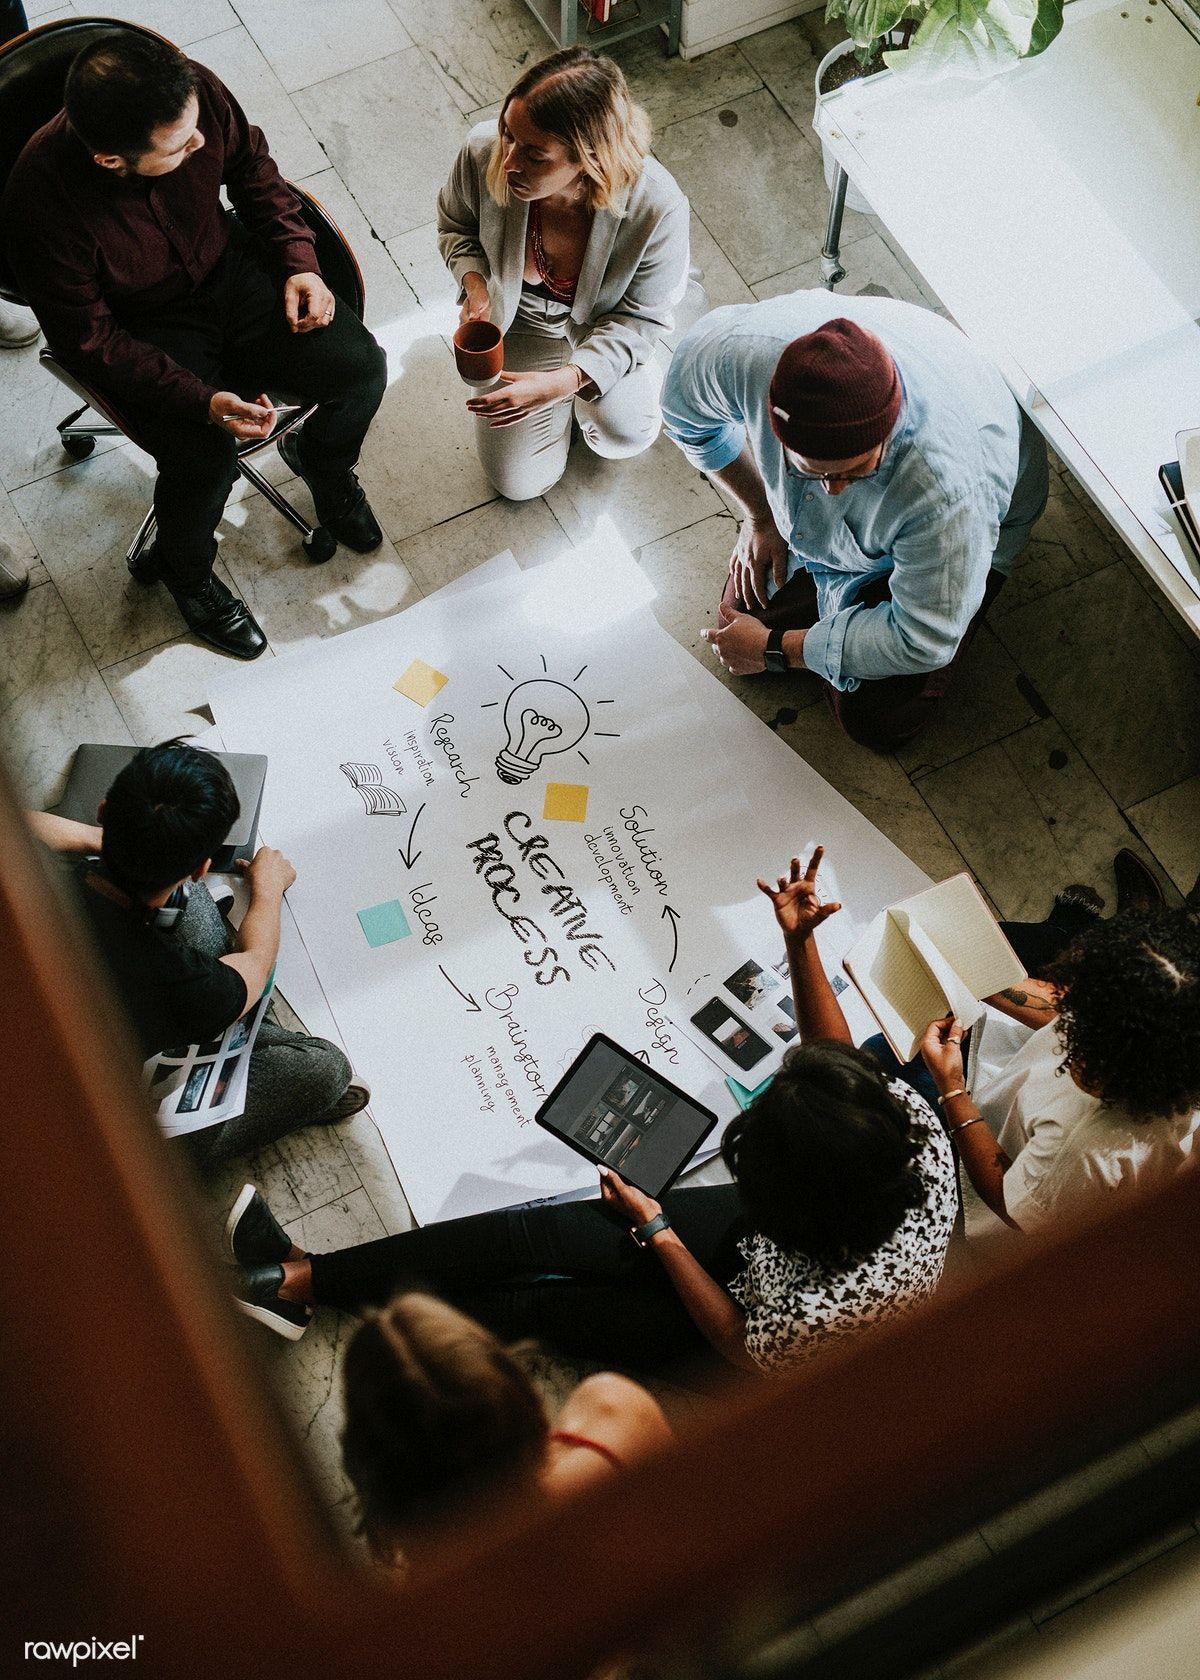 Download Premium Photo Of Business People Brainstorming